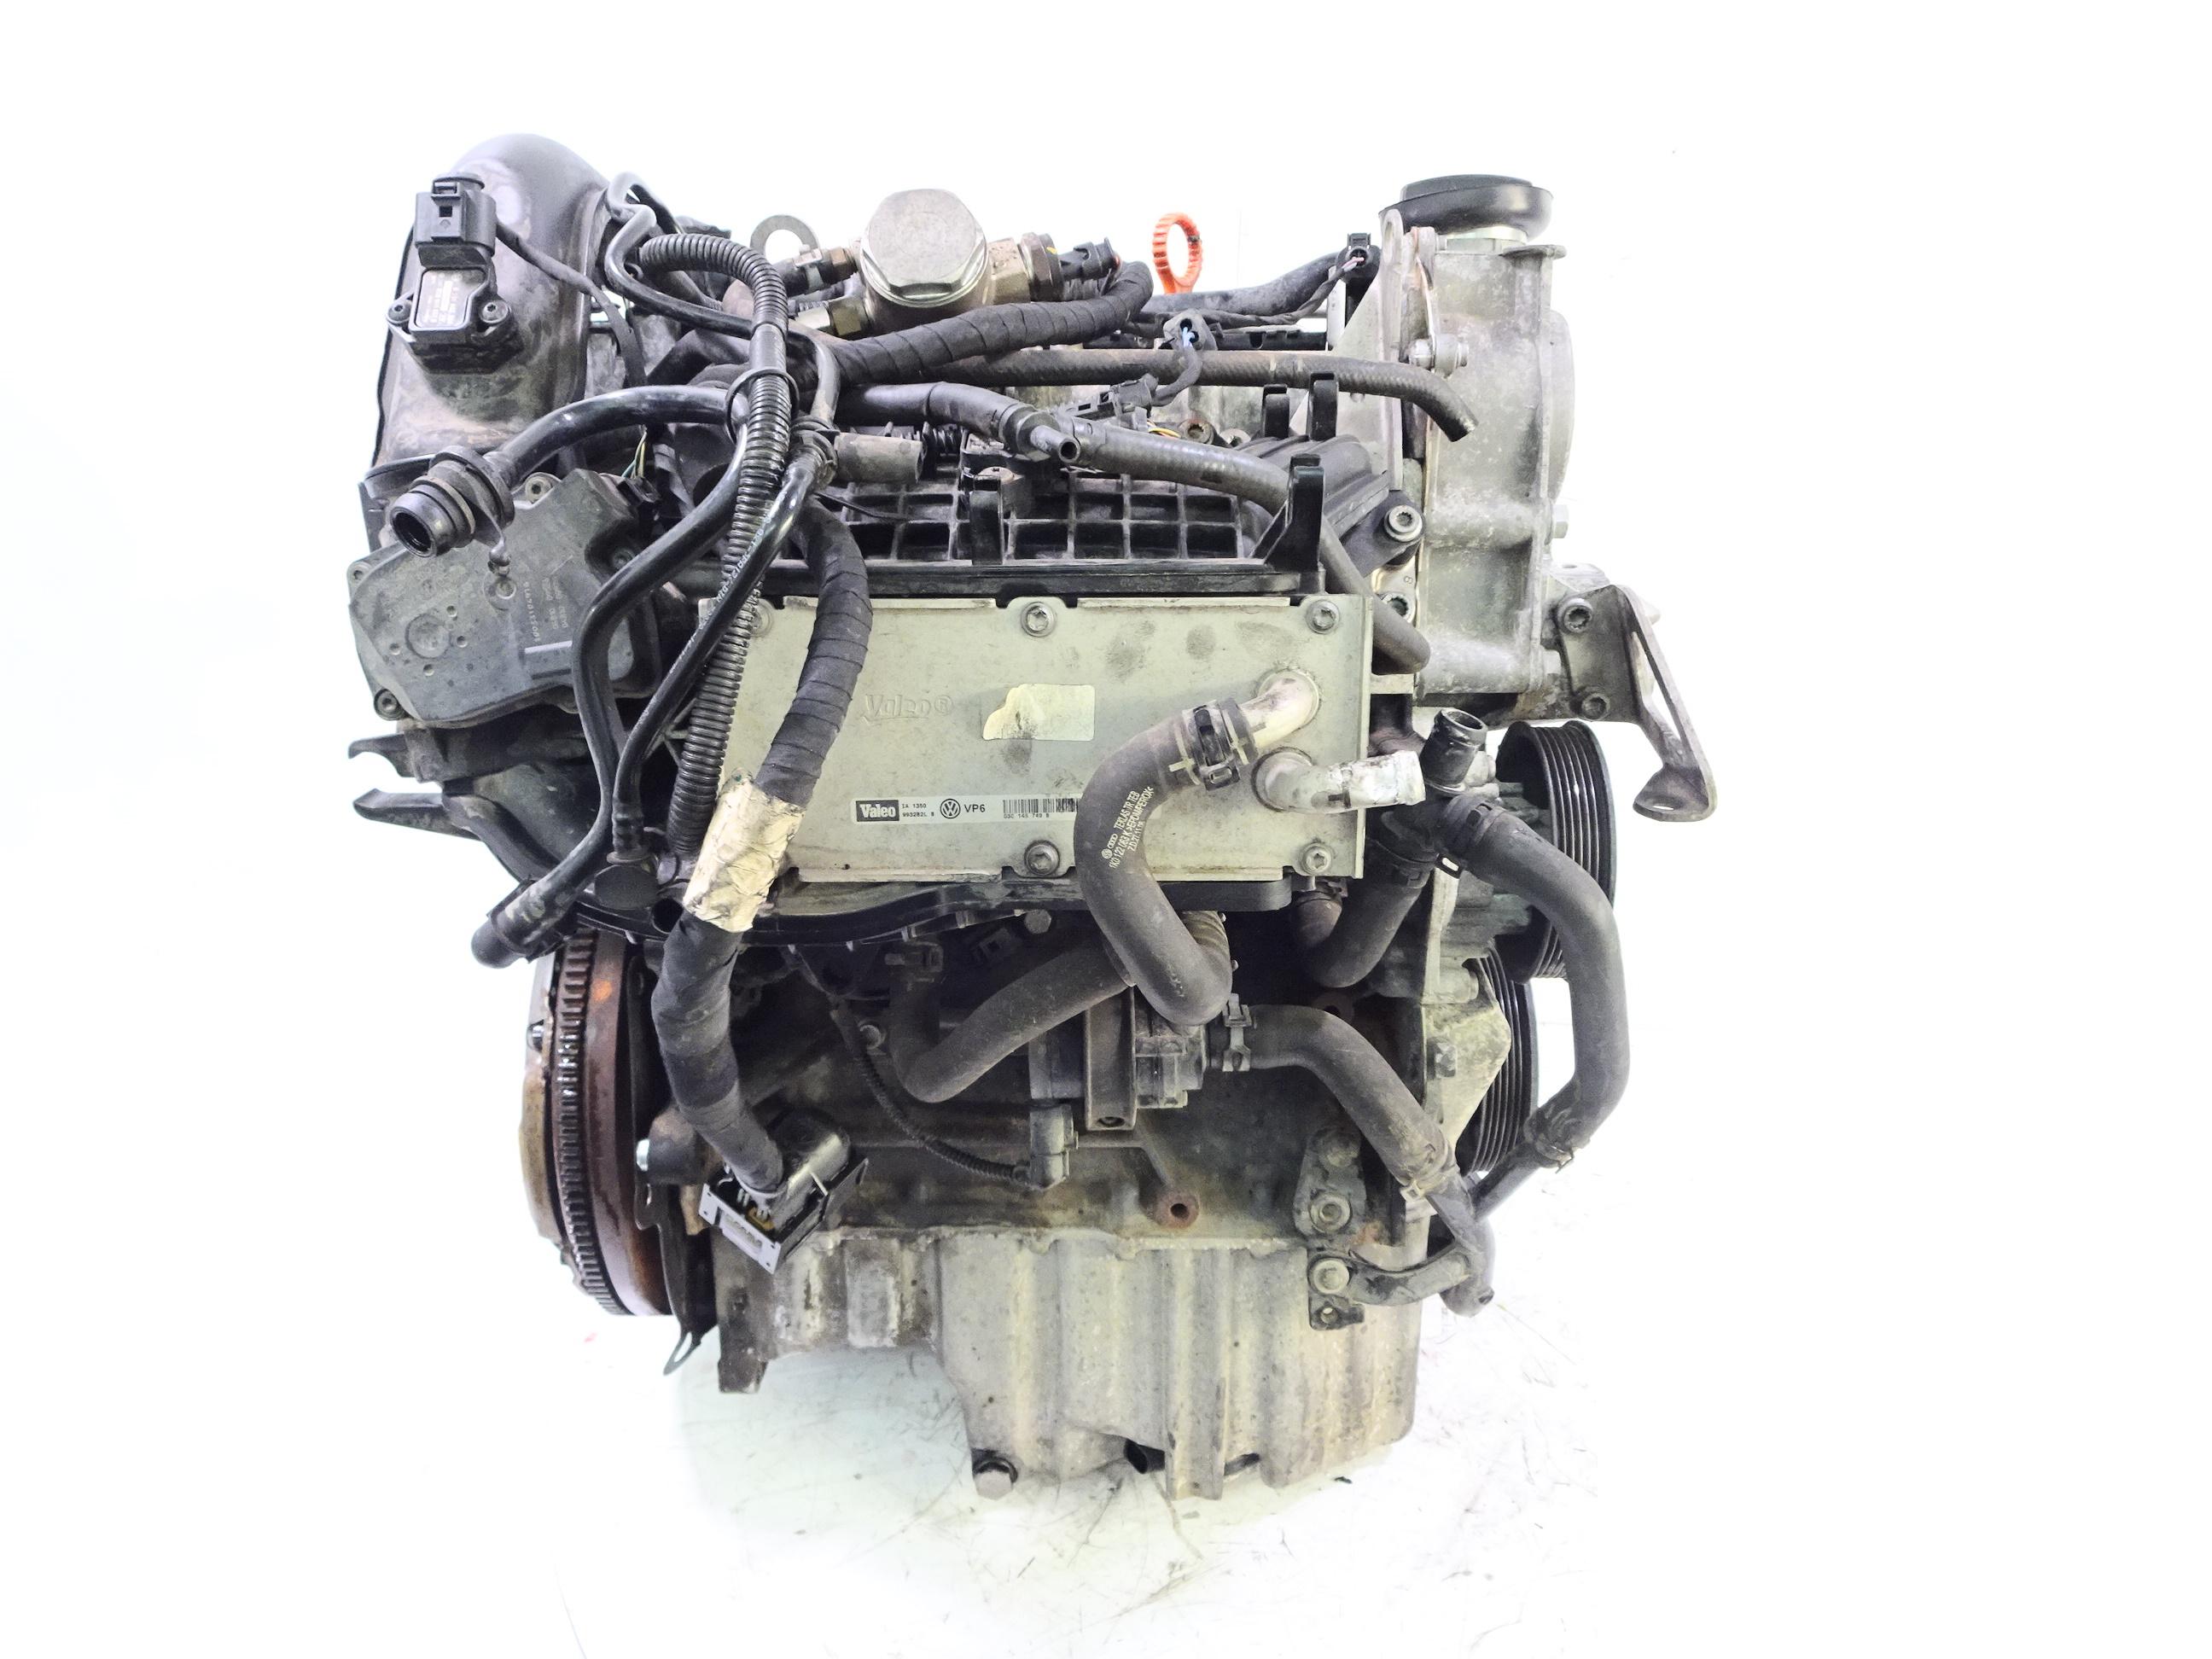 Motor 2012 Audi Seat Skoda VW A1 A3 1,4 TFSI CAX CAXA CAXC mit Anbauteilen